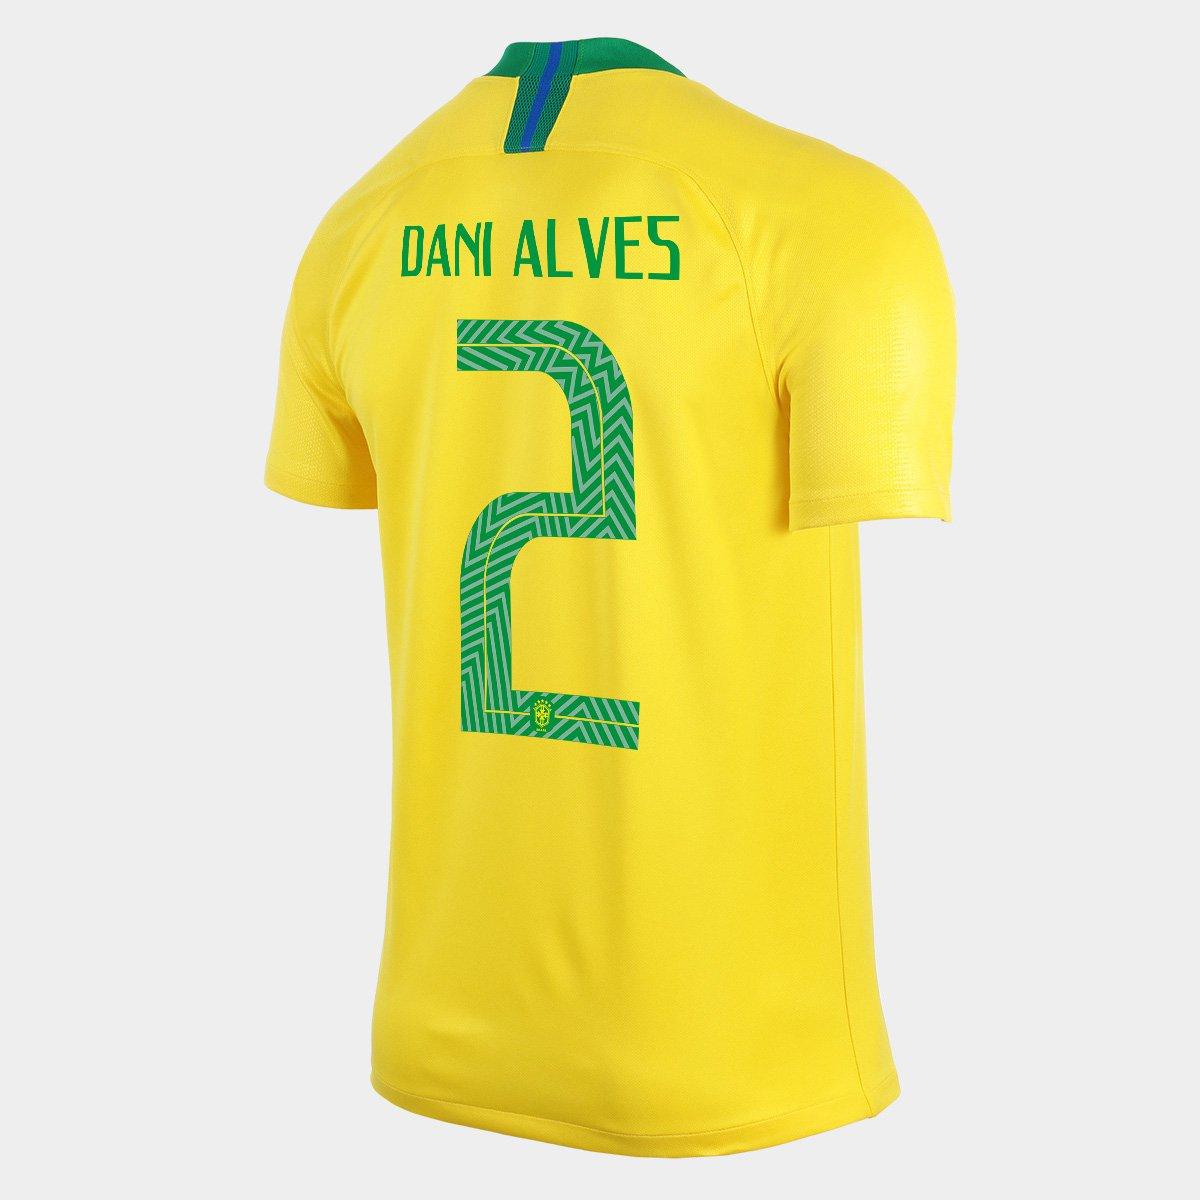 acc5d52bc6 Camisa Seleção Brasil I 2018 nº 2 Dani Alves - Torcedor Nike Masculina -  Compre Agora